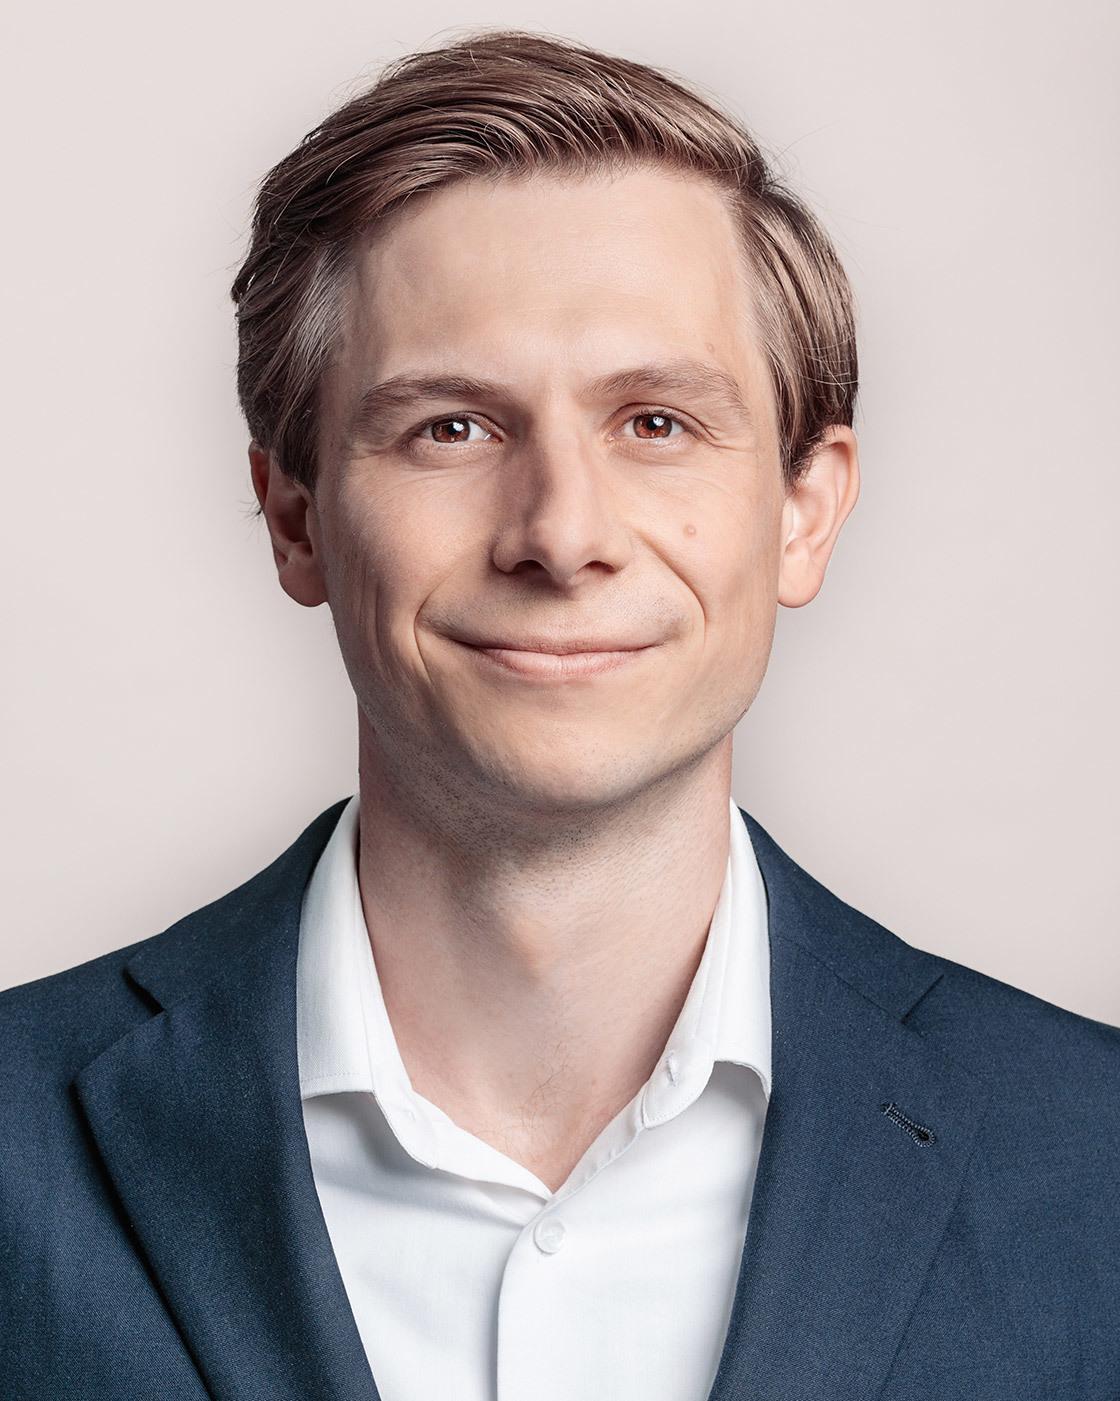 Pascal Stichler